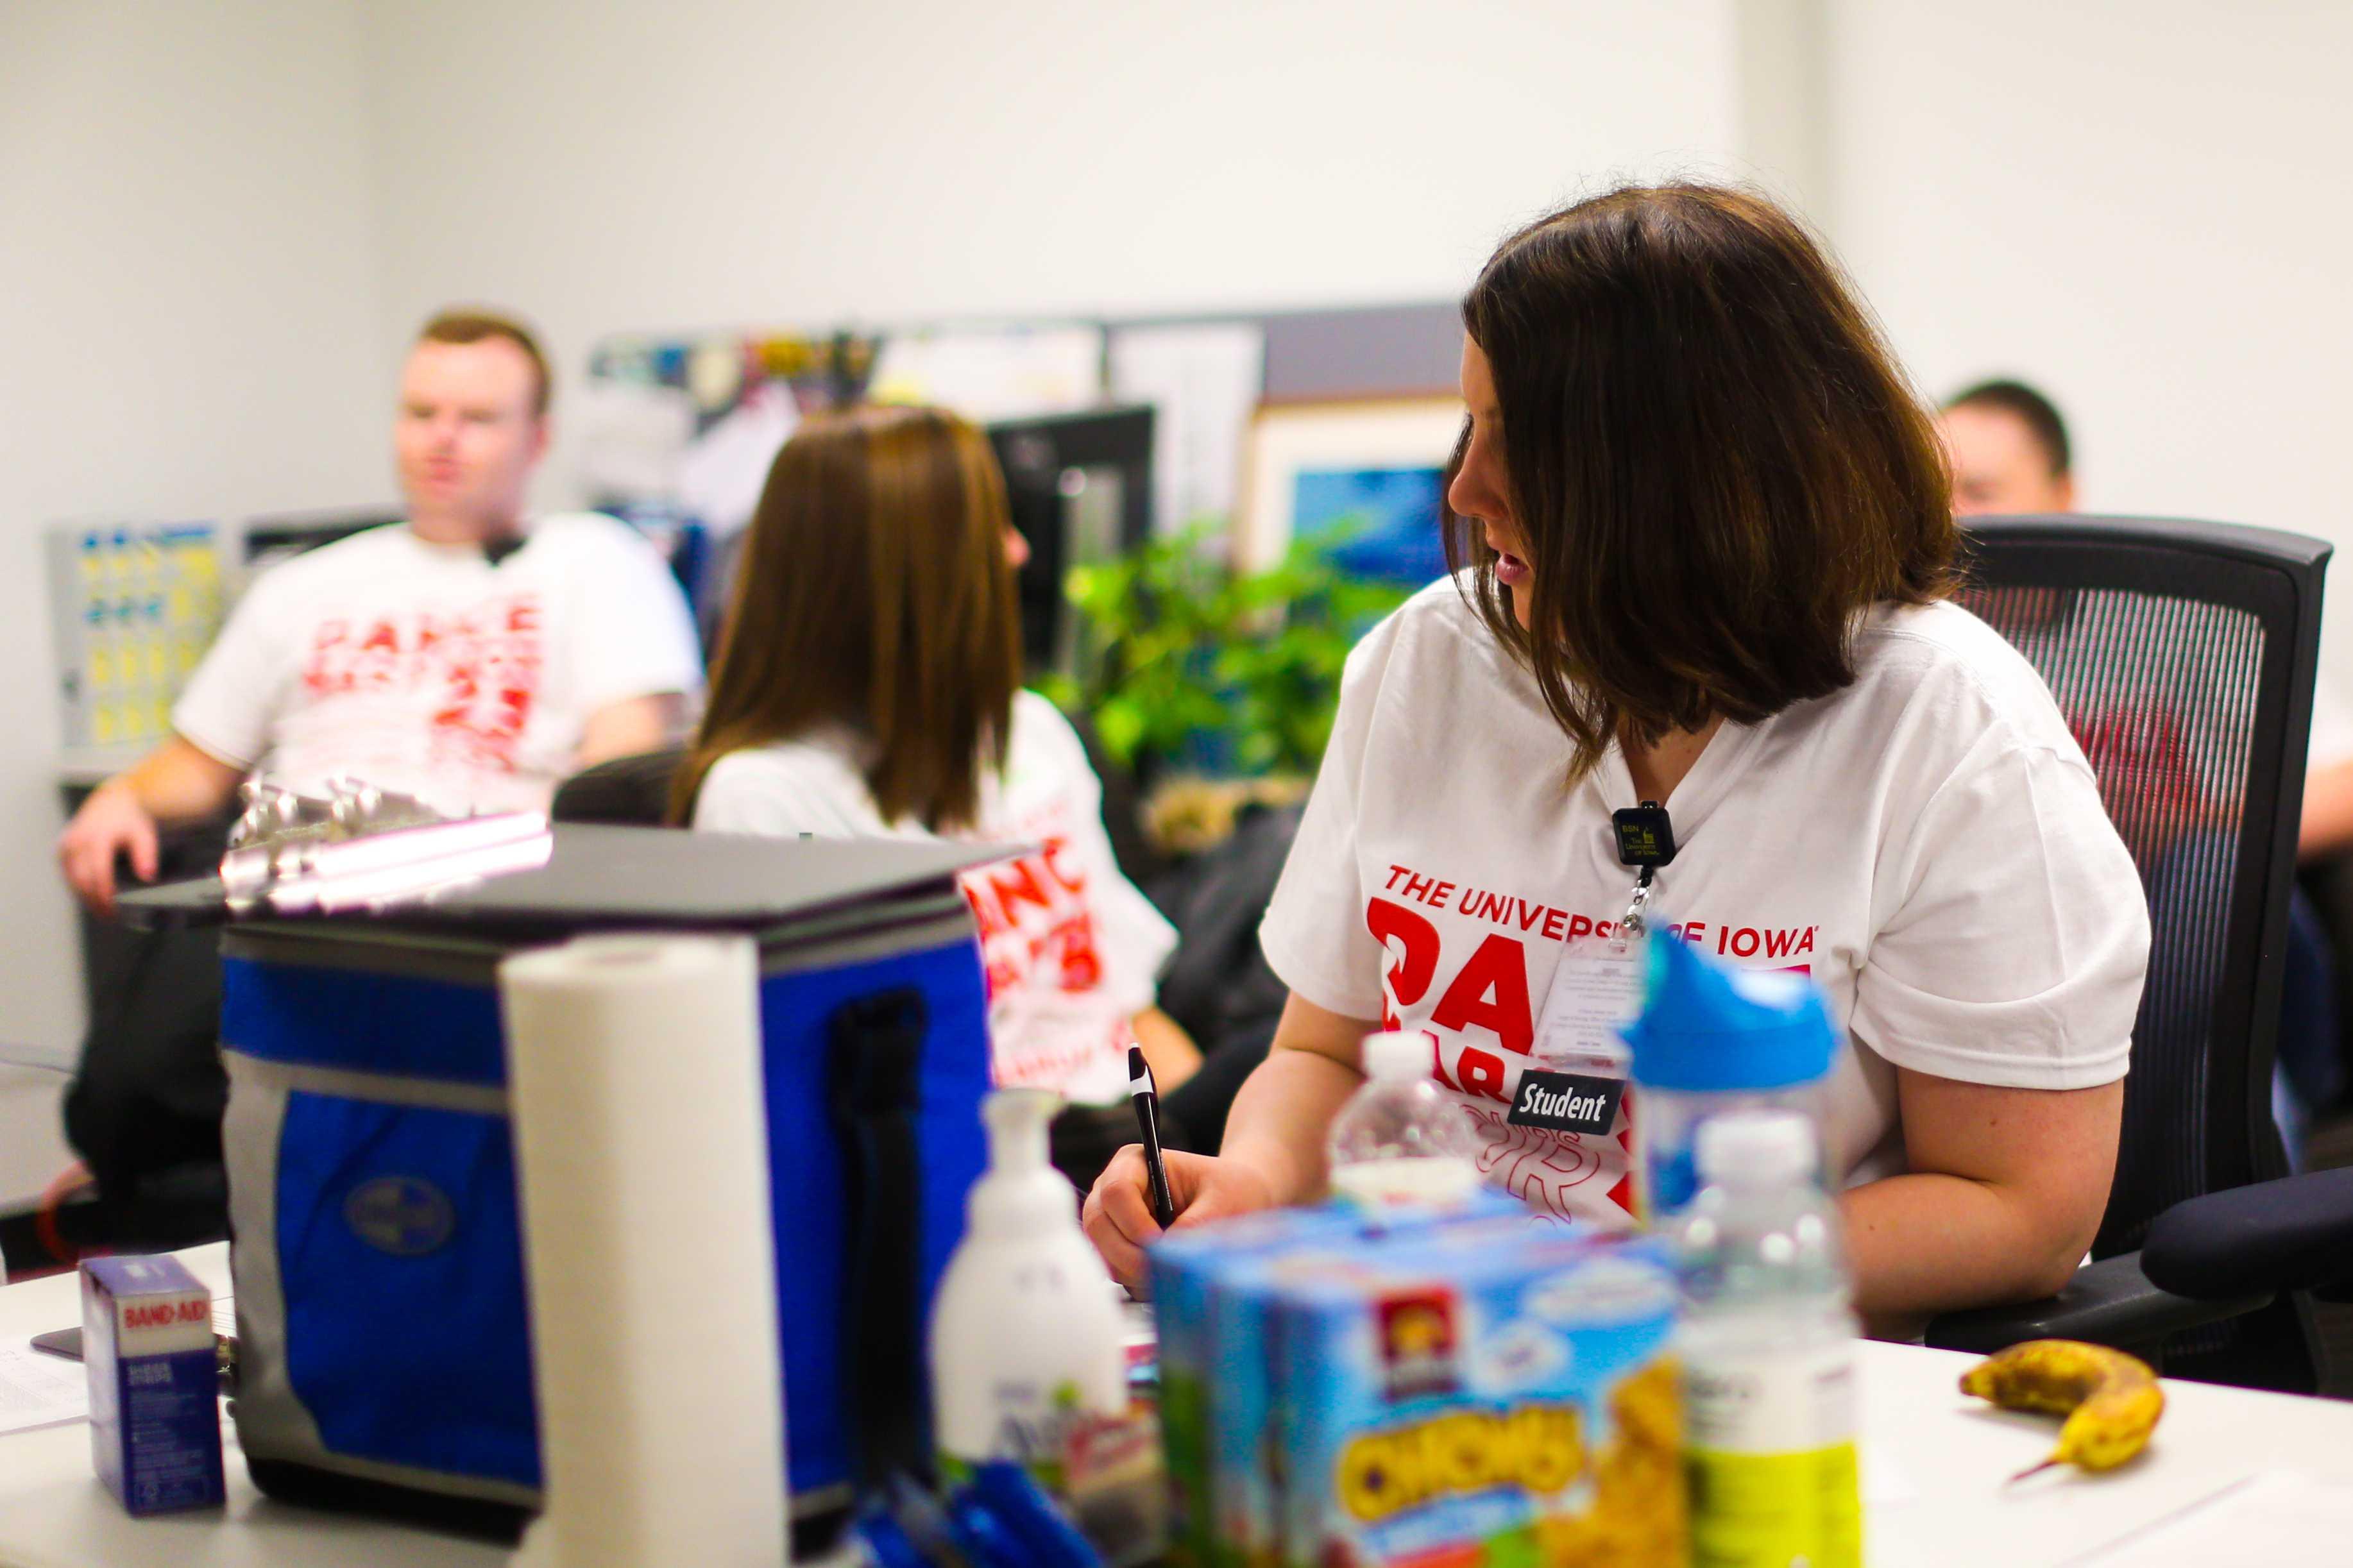 Amelia Jones, a UI freshman, volunteers as a first aid provider for Dance Marathon 23. (The Daily Iowan/Osama Khalid)